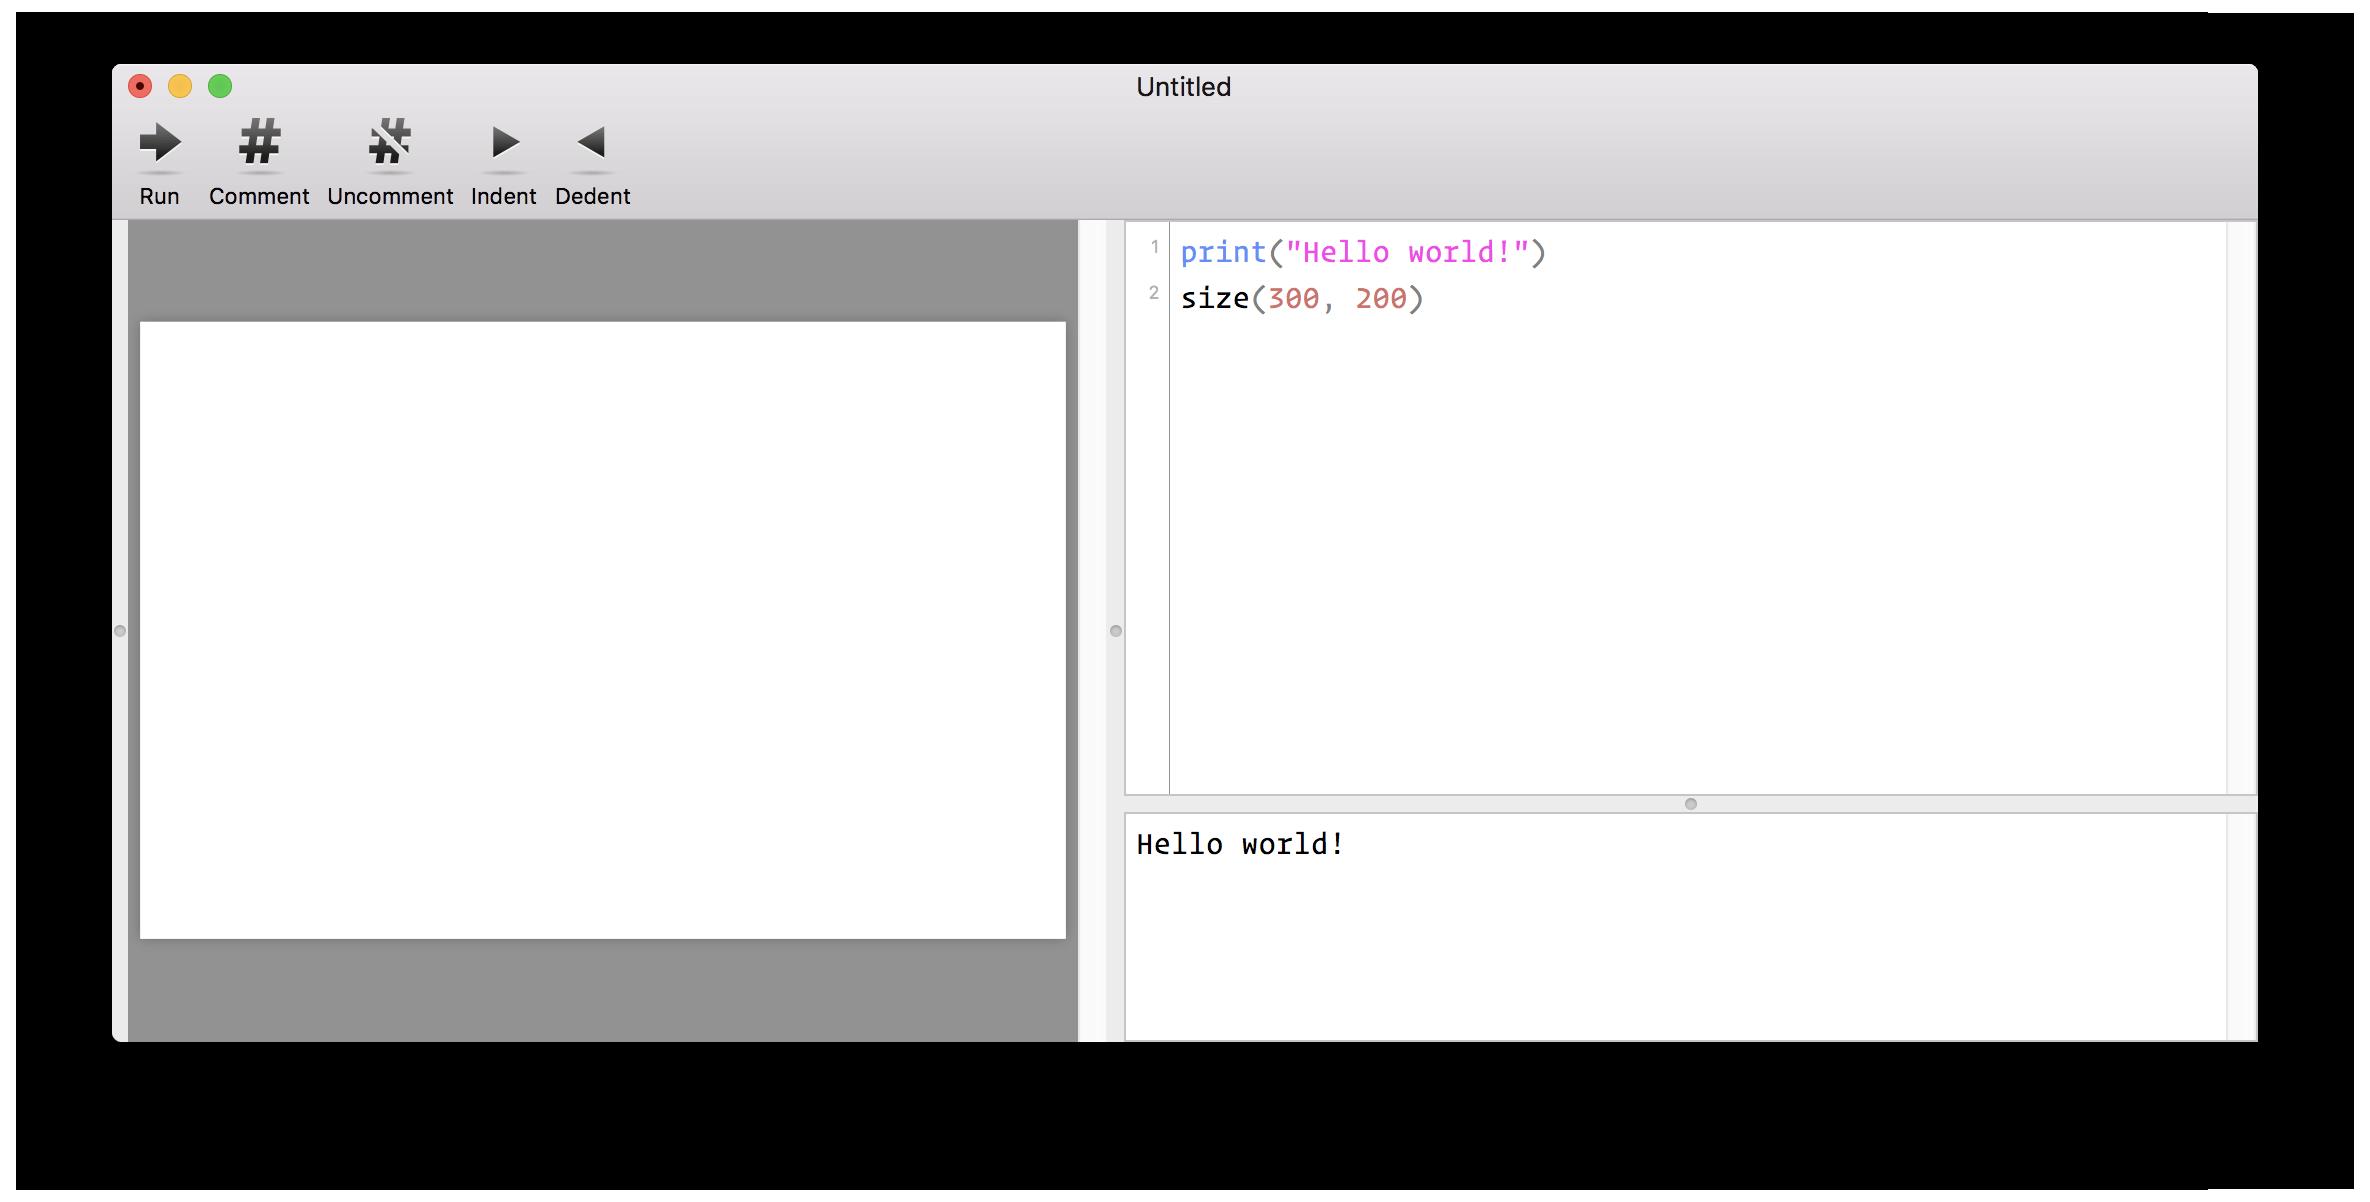 python_HelloWorld-Size.jpg